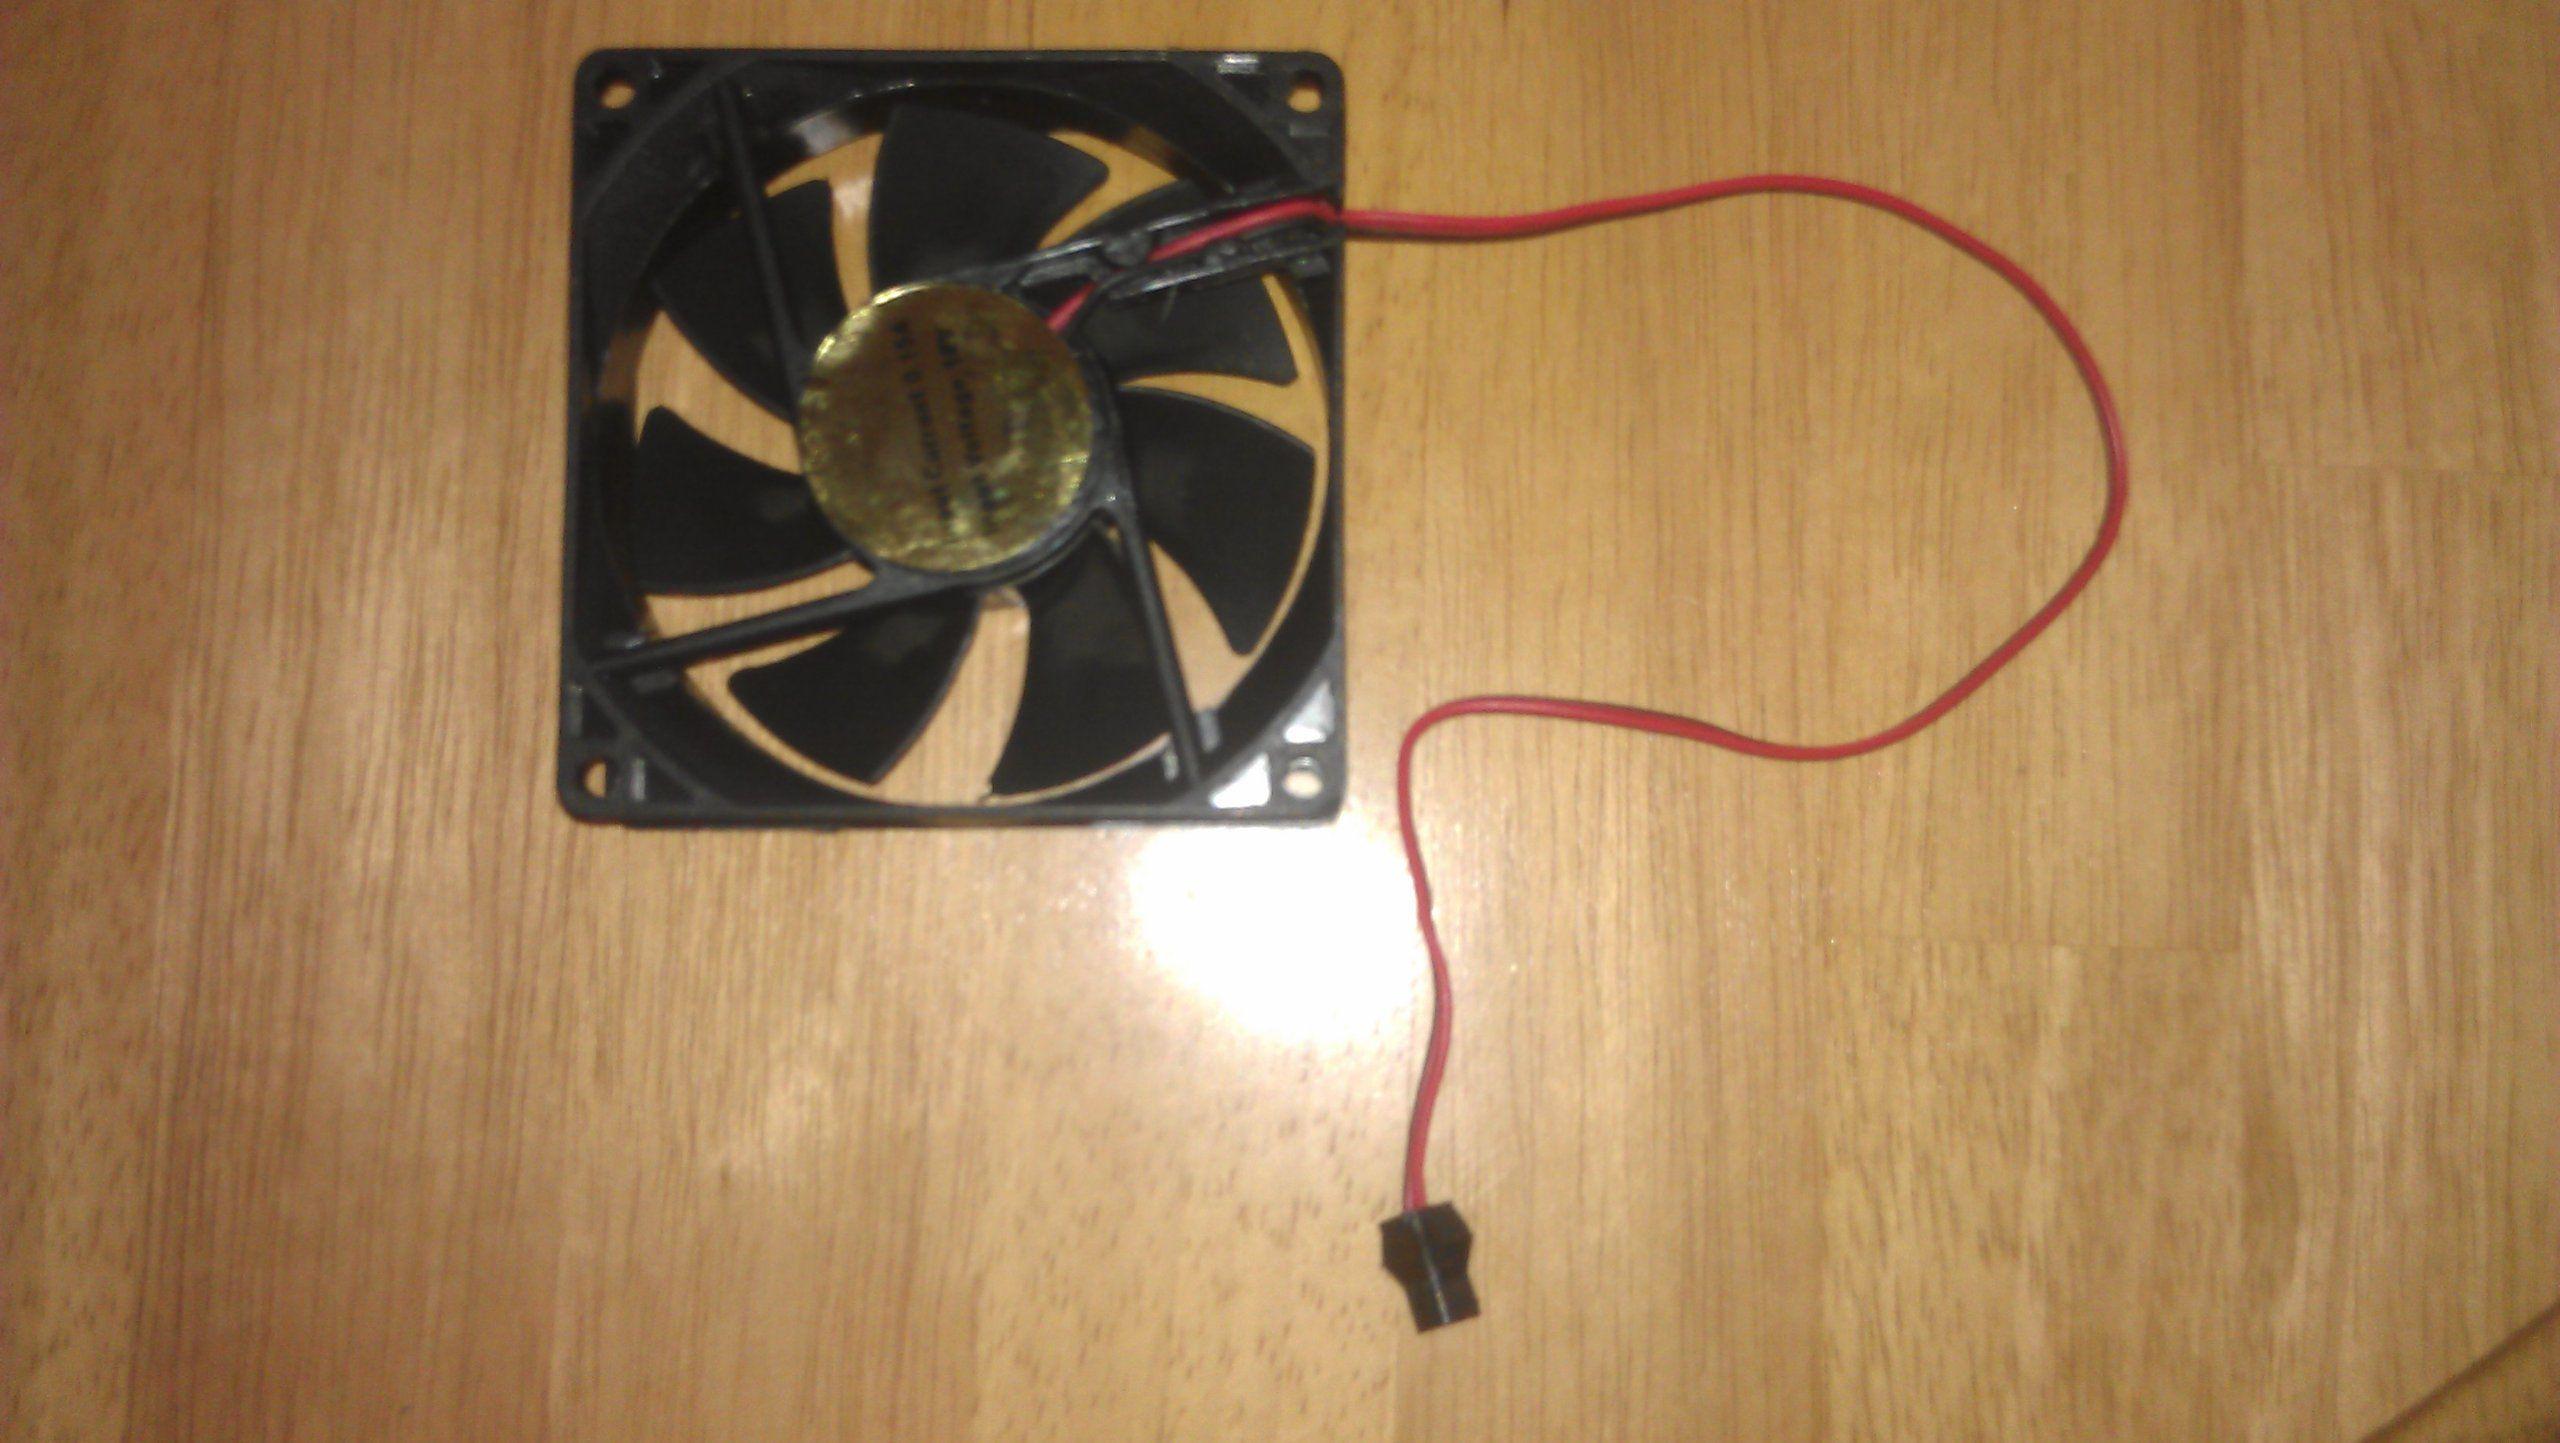 12 Volt Mini Cooling Fan 3x1 2mm Plug 15 Amp 12 Volt Mini